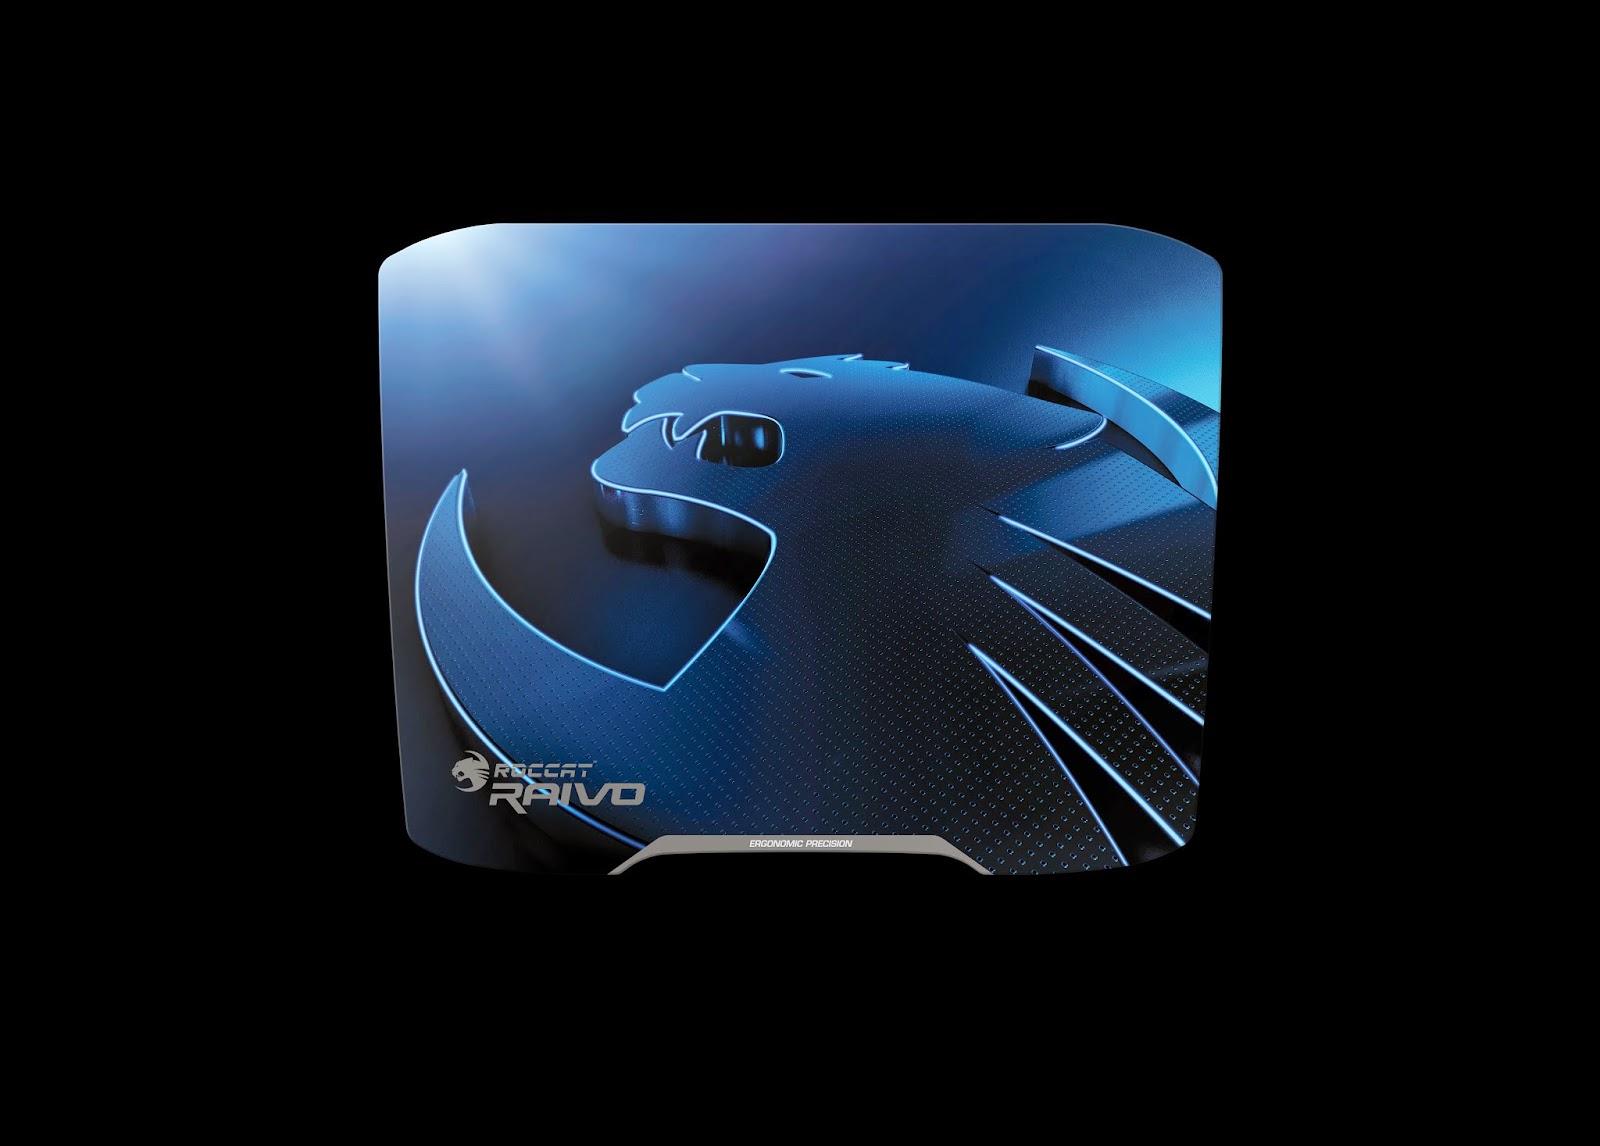 Unboxing & Review - ROCCAT RAIVO 25